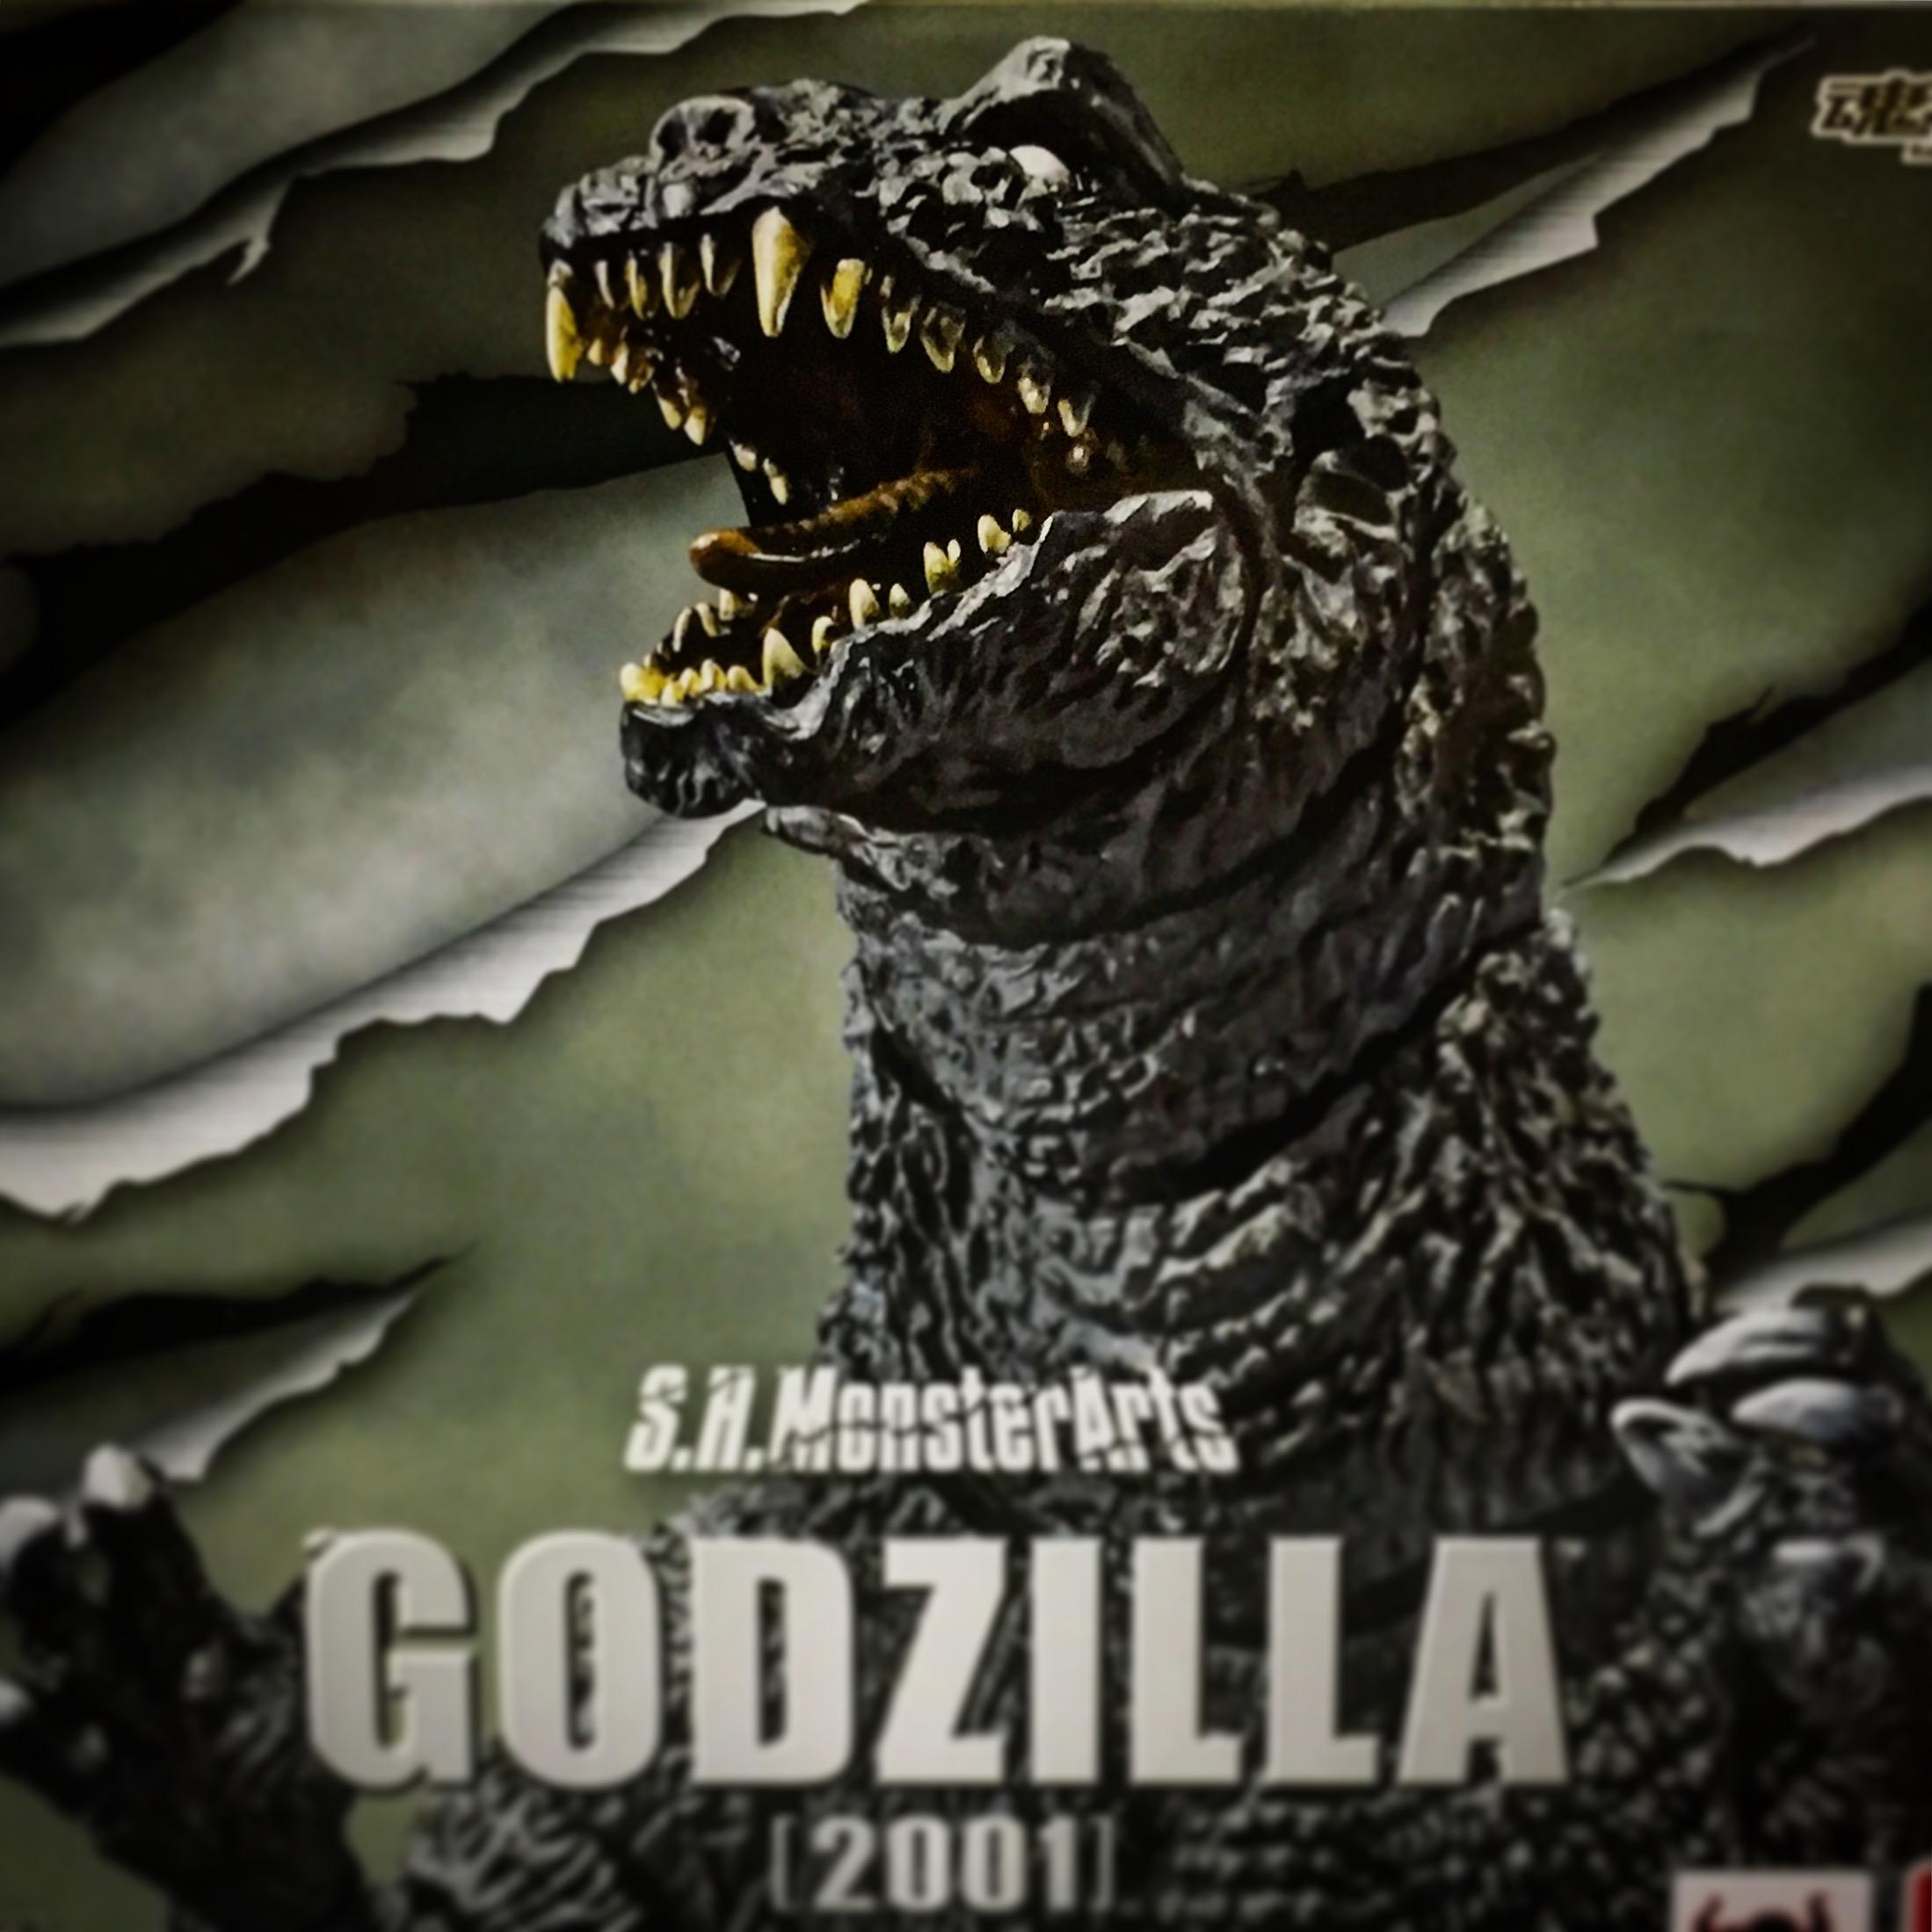 S.H.MonsterArts ゴジラ(2001)パッケージ